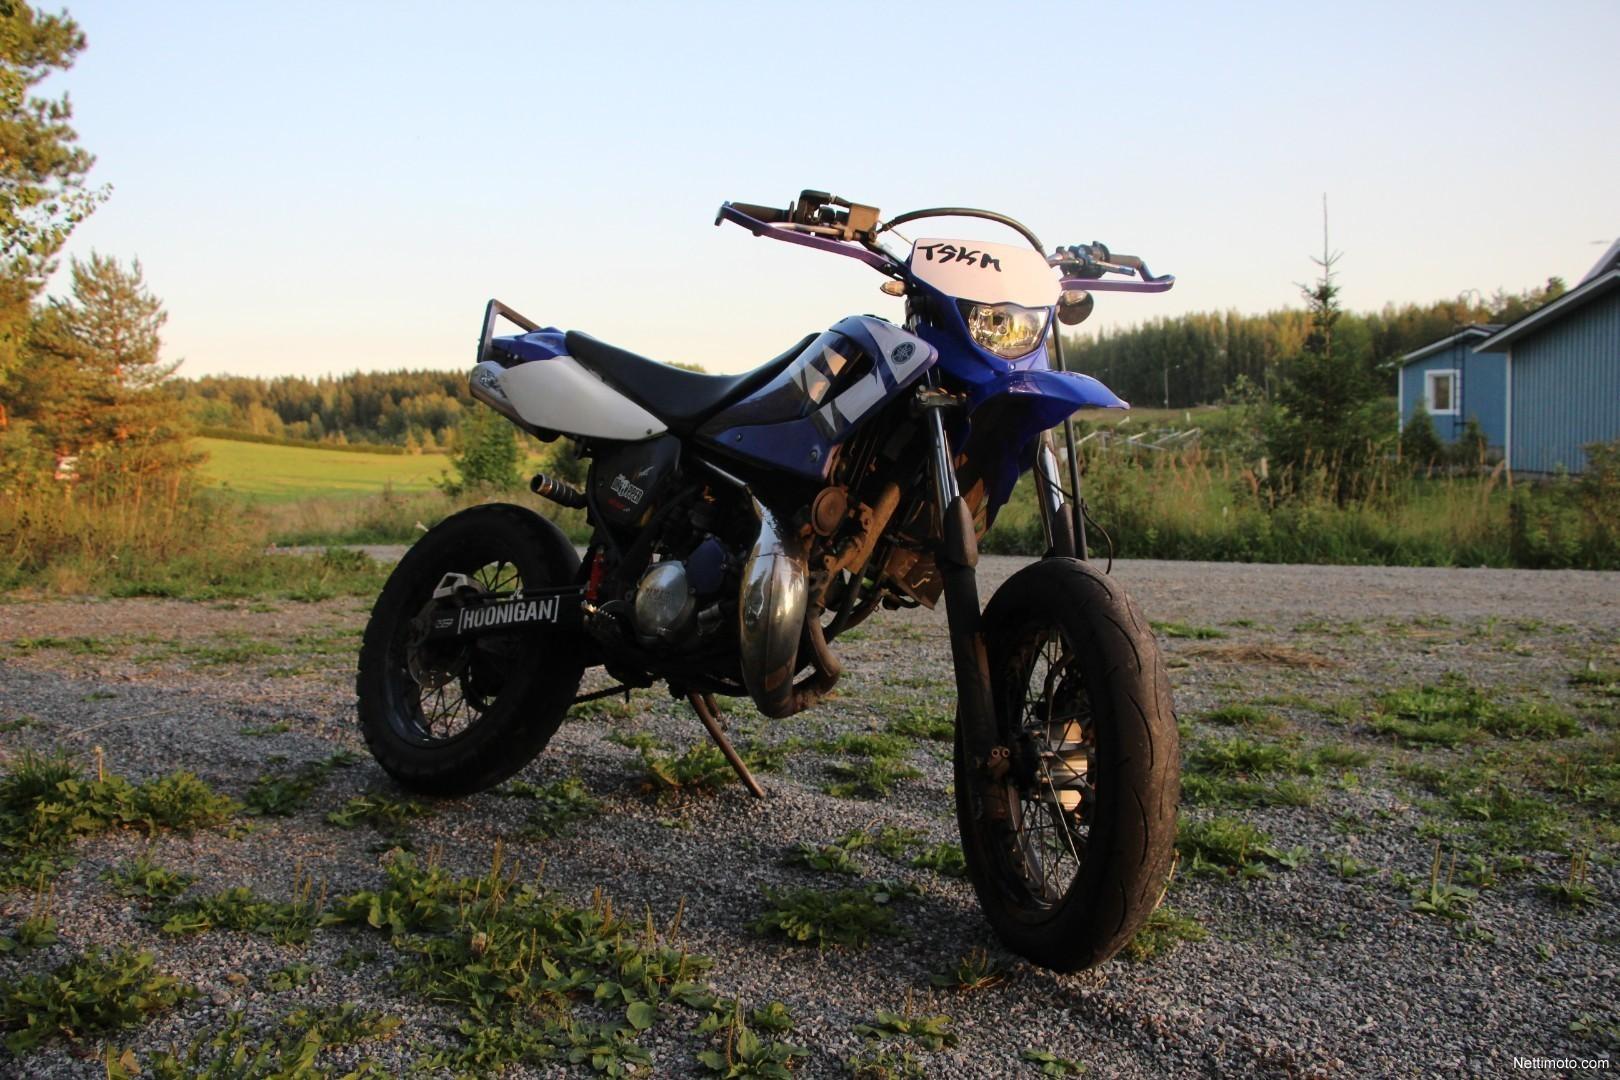 Aj Auto Sales 2 >> Yamaha Dt 125 X 125 Cm 2007 Ylojarvi Motorcycle Nettimoto